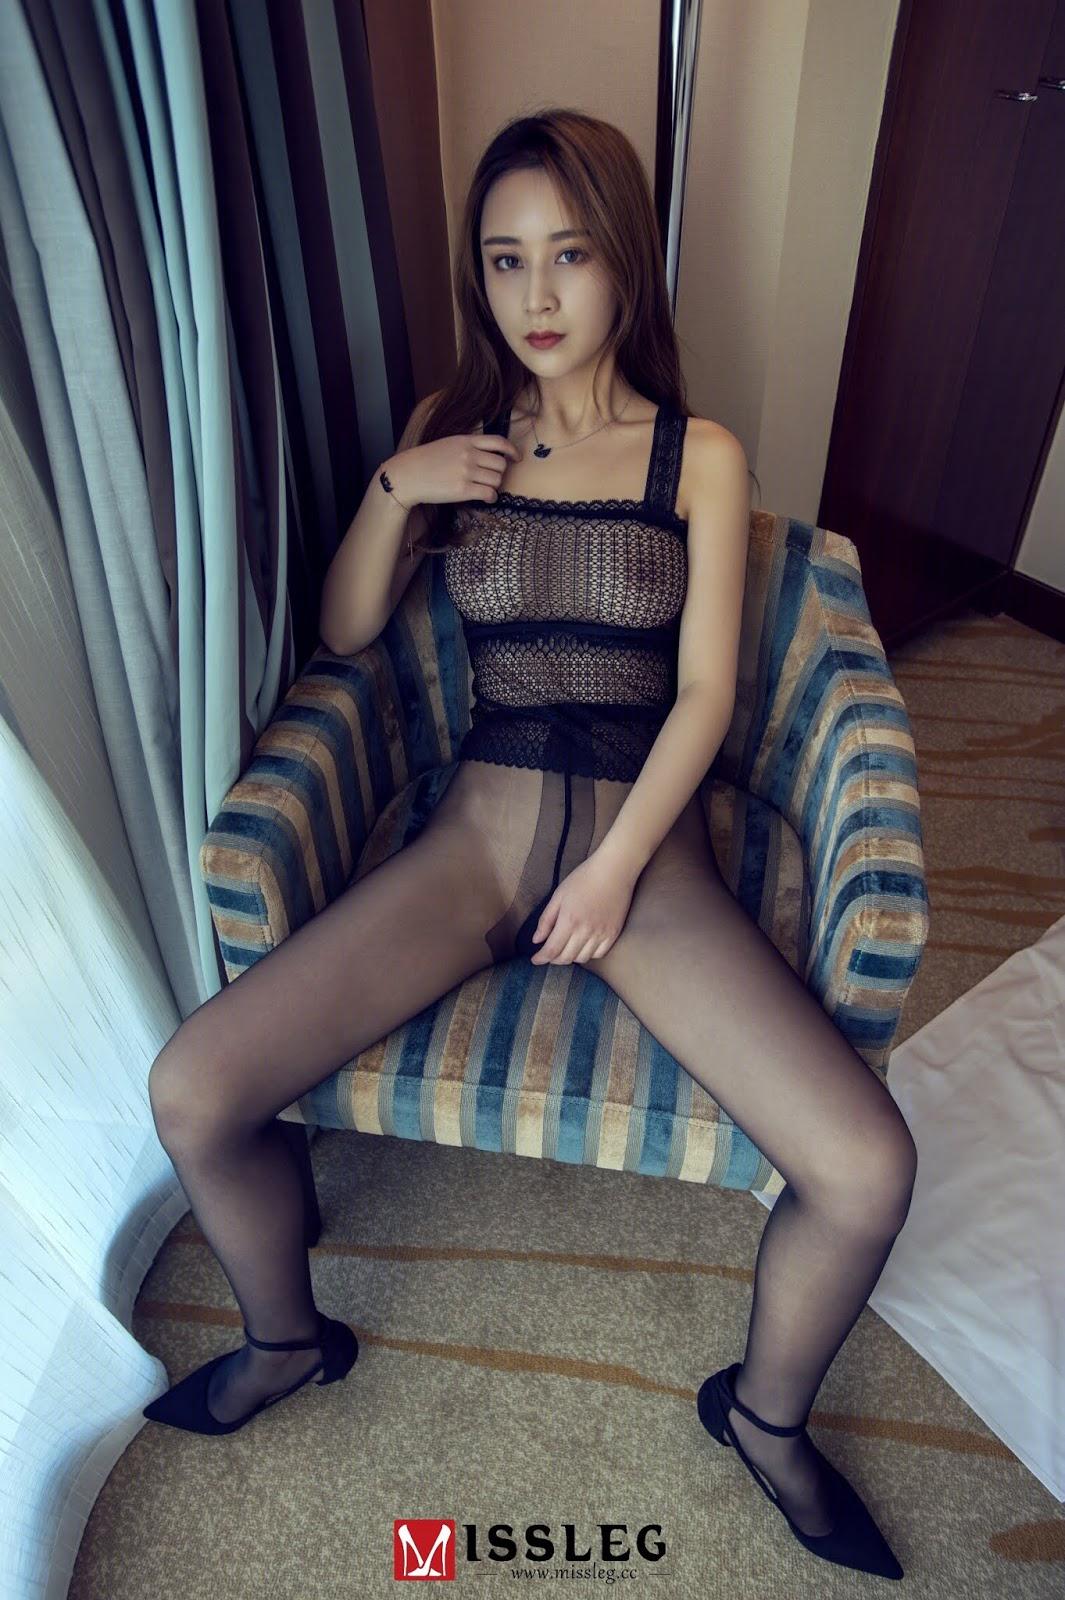 Chinese Model 嫩模乔 MissLeg No 005 (61 Pict)